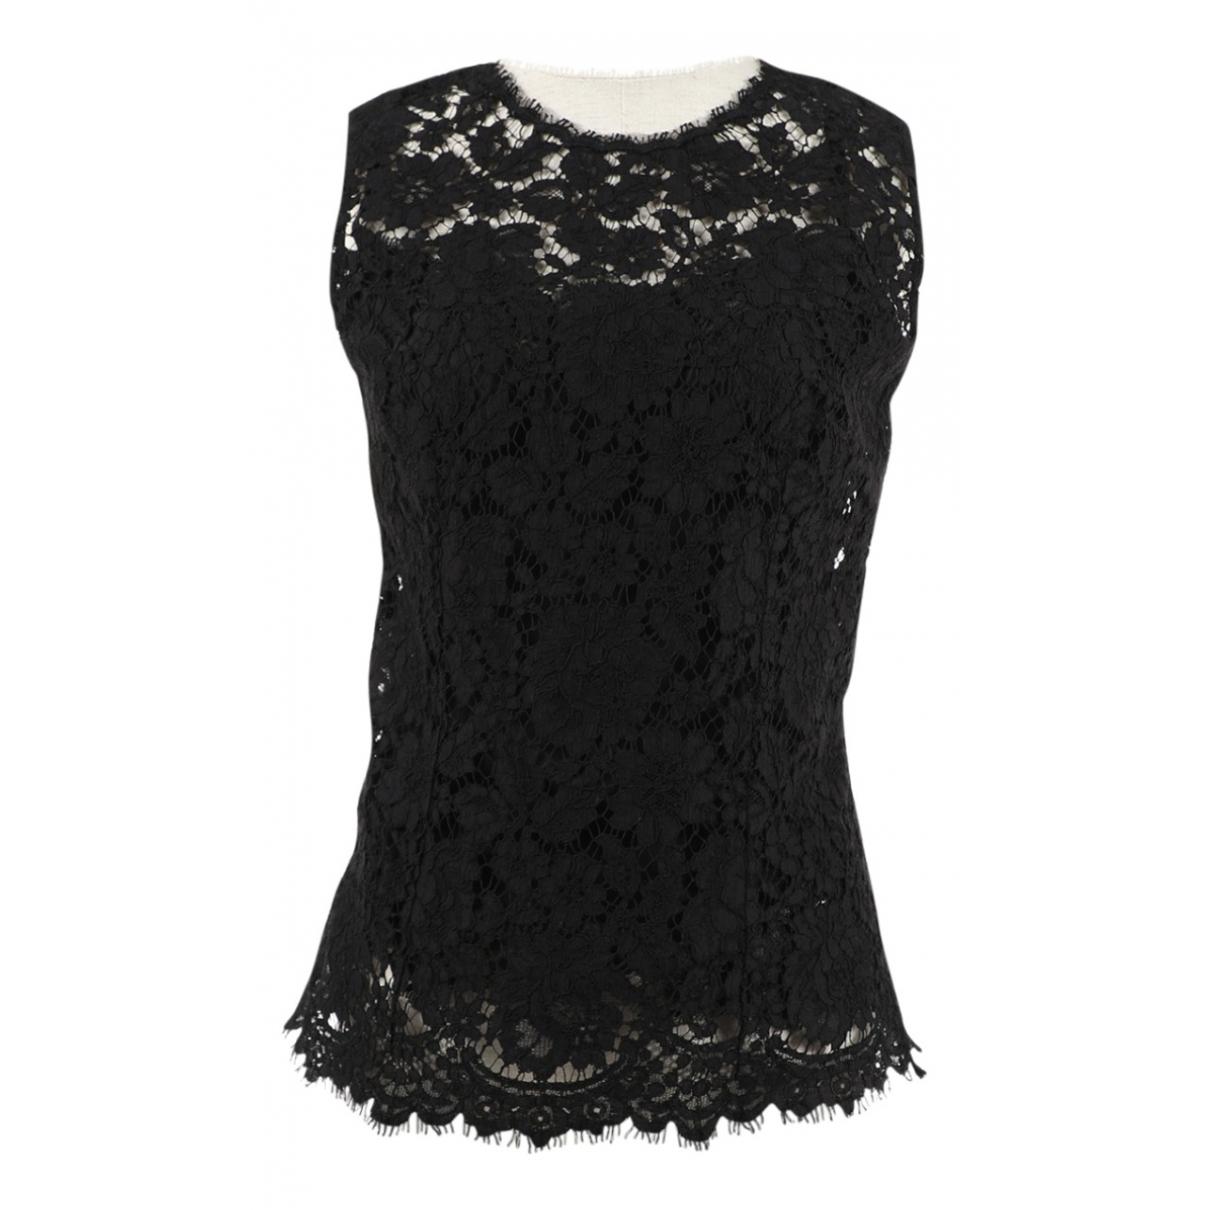 Dolce & Gabbana \N Black Lace  top for Women 38 IT